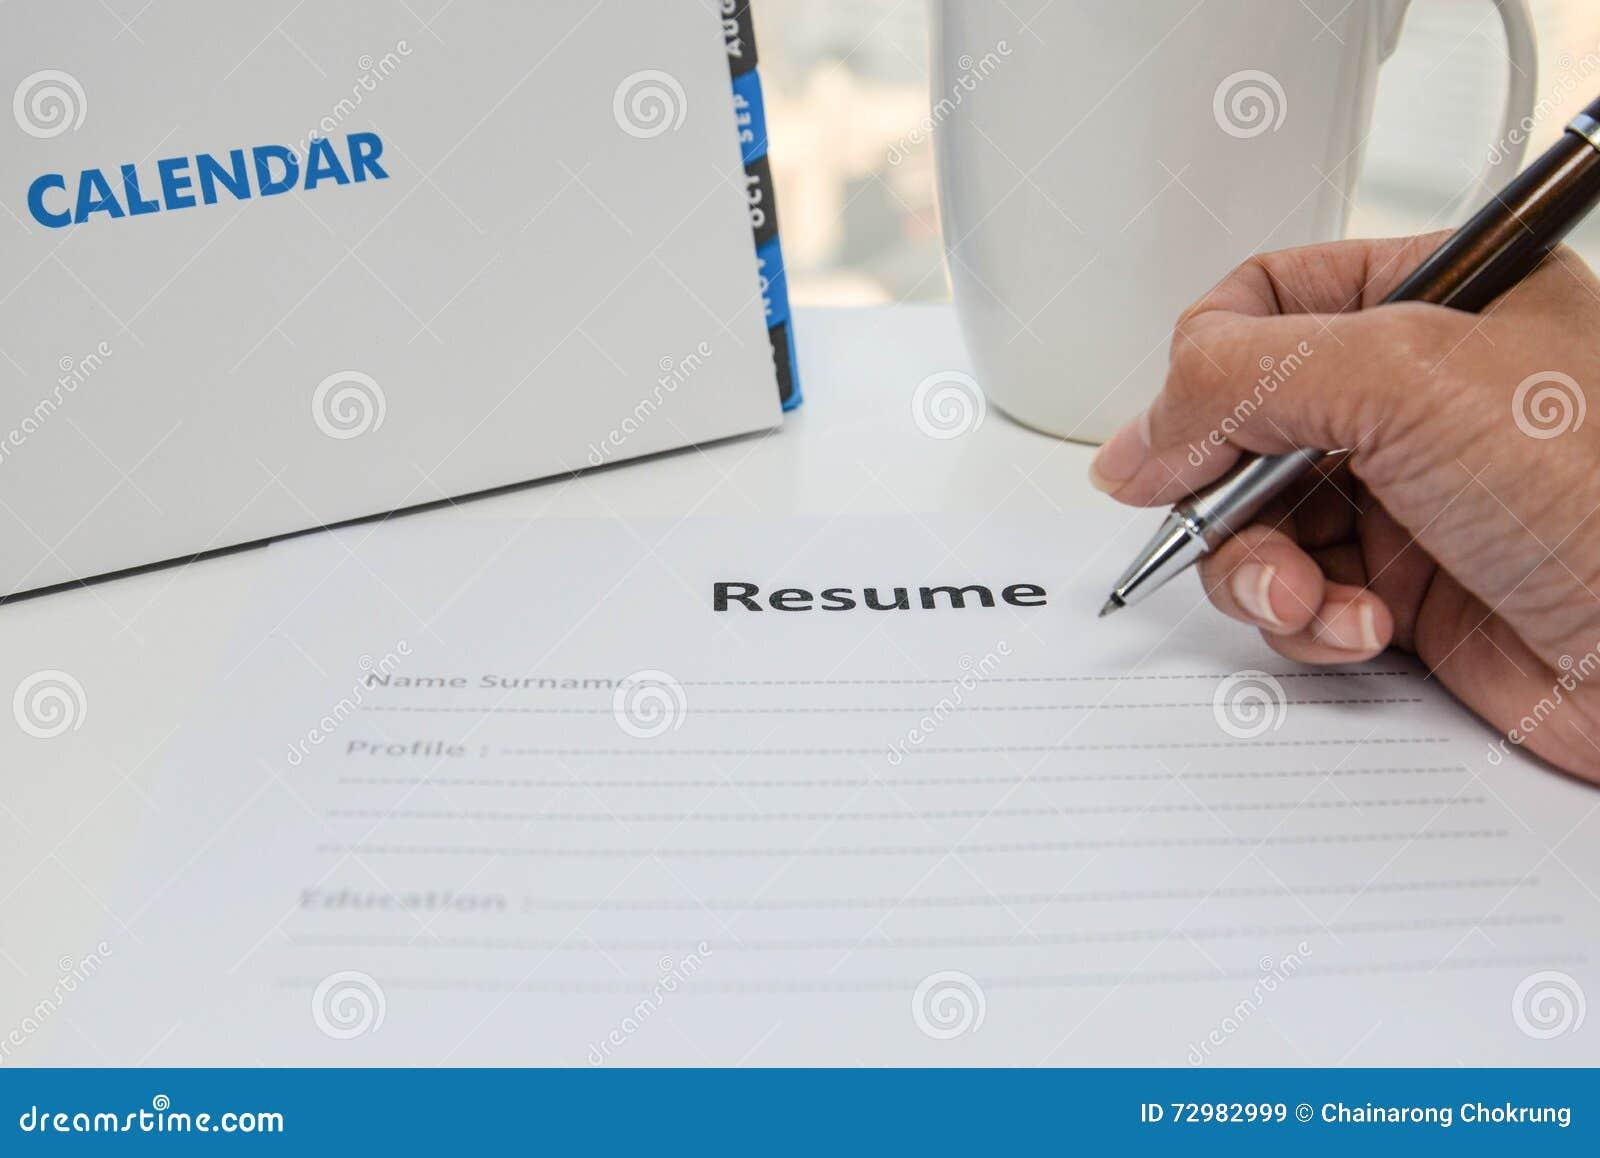 Escritura Del Curriculum Vitae Imagen de archivo - Imagen de resume ...